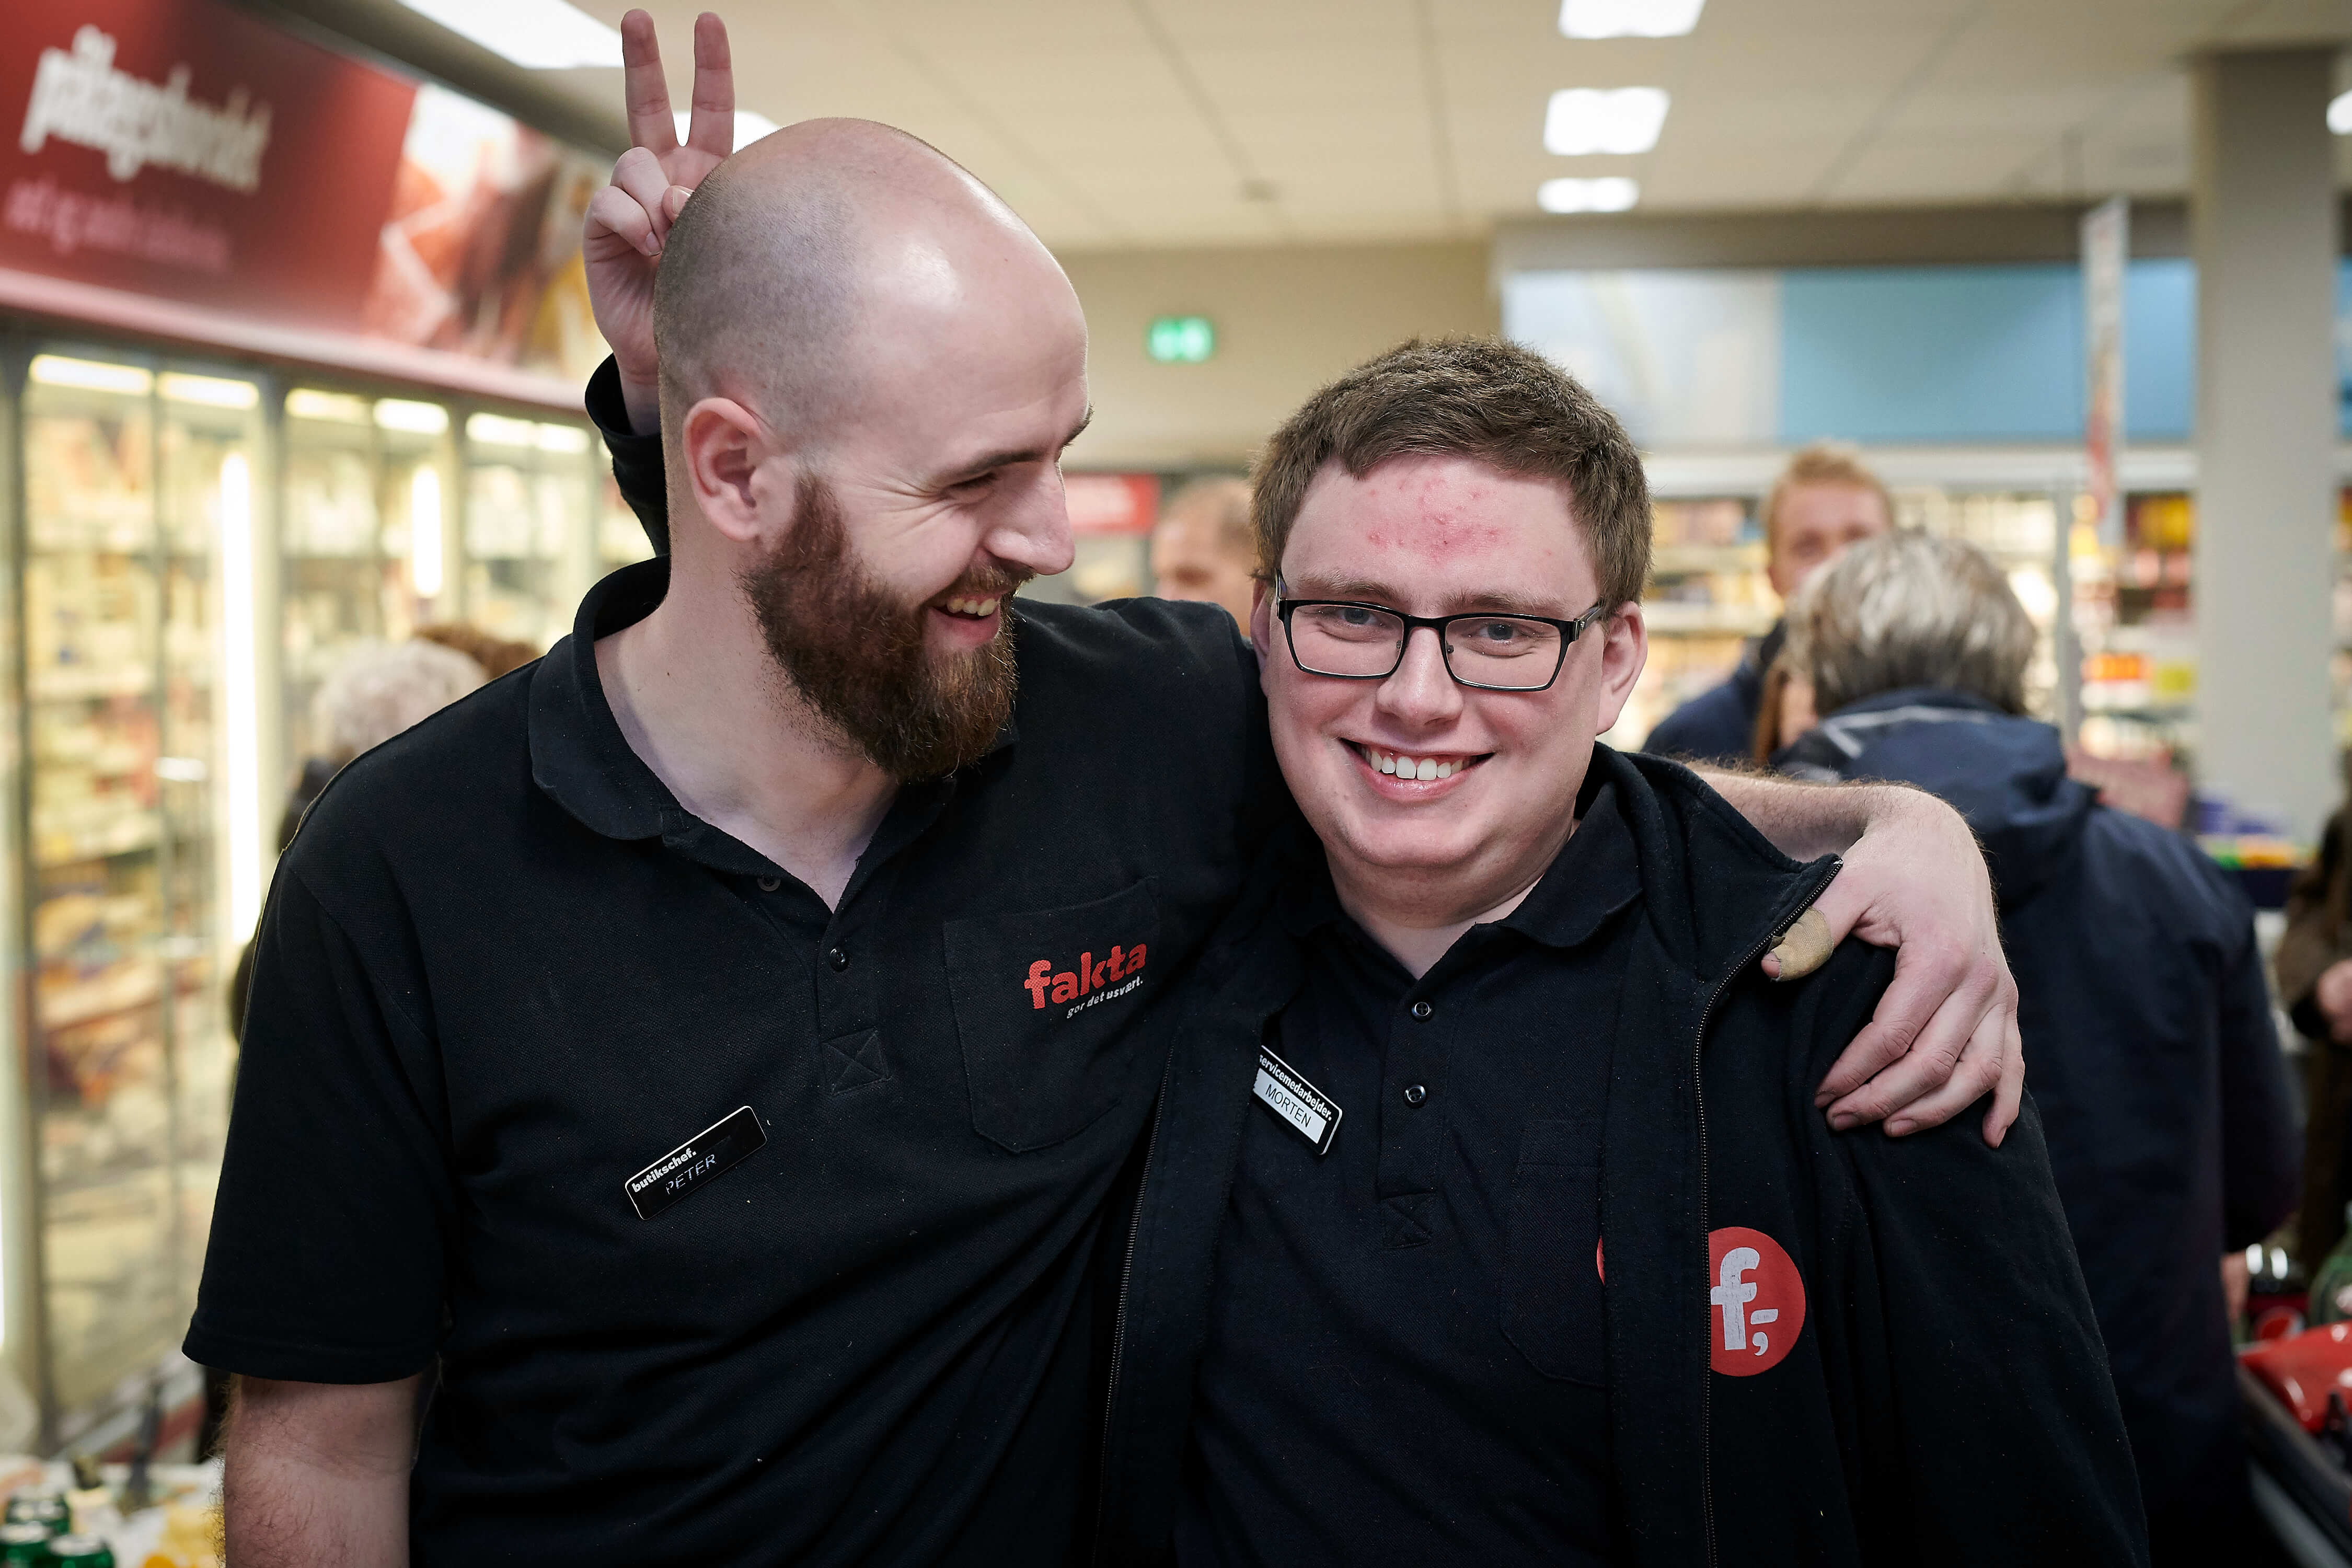 Autisme i job via kommunalt-privat samarbejde